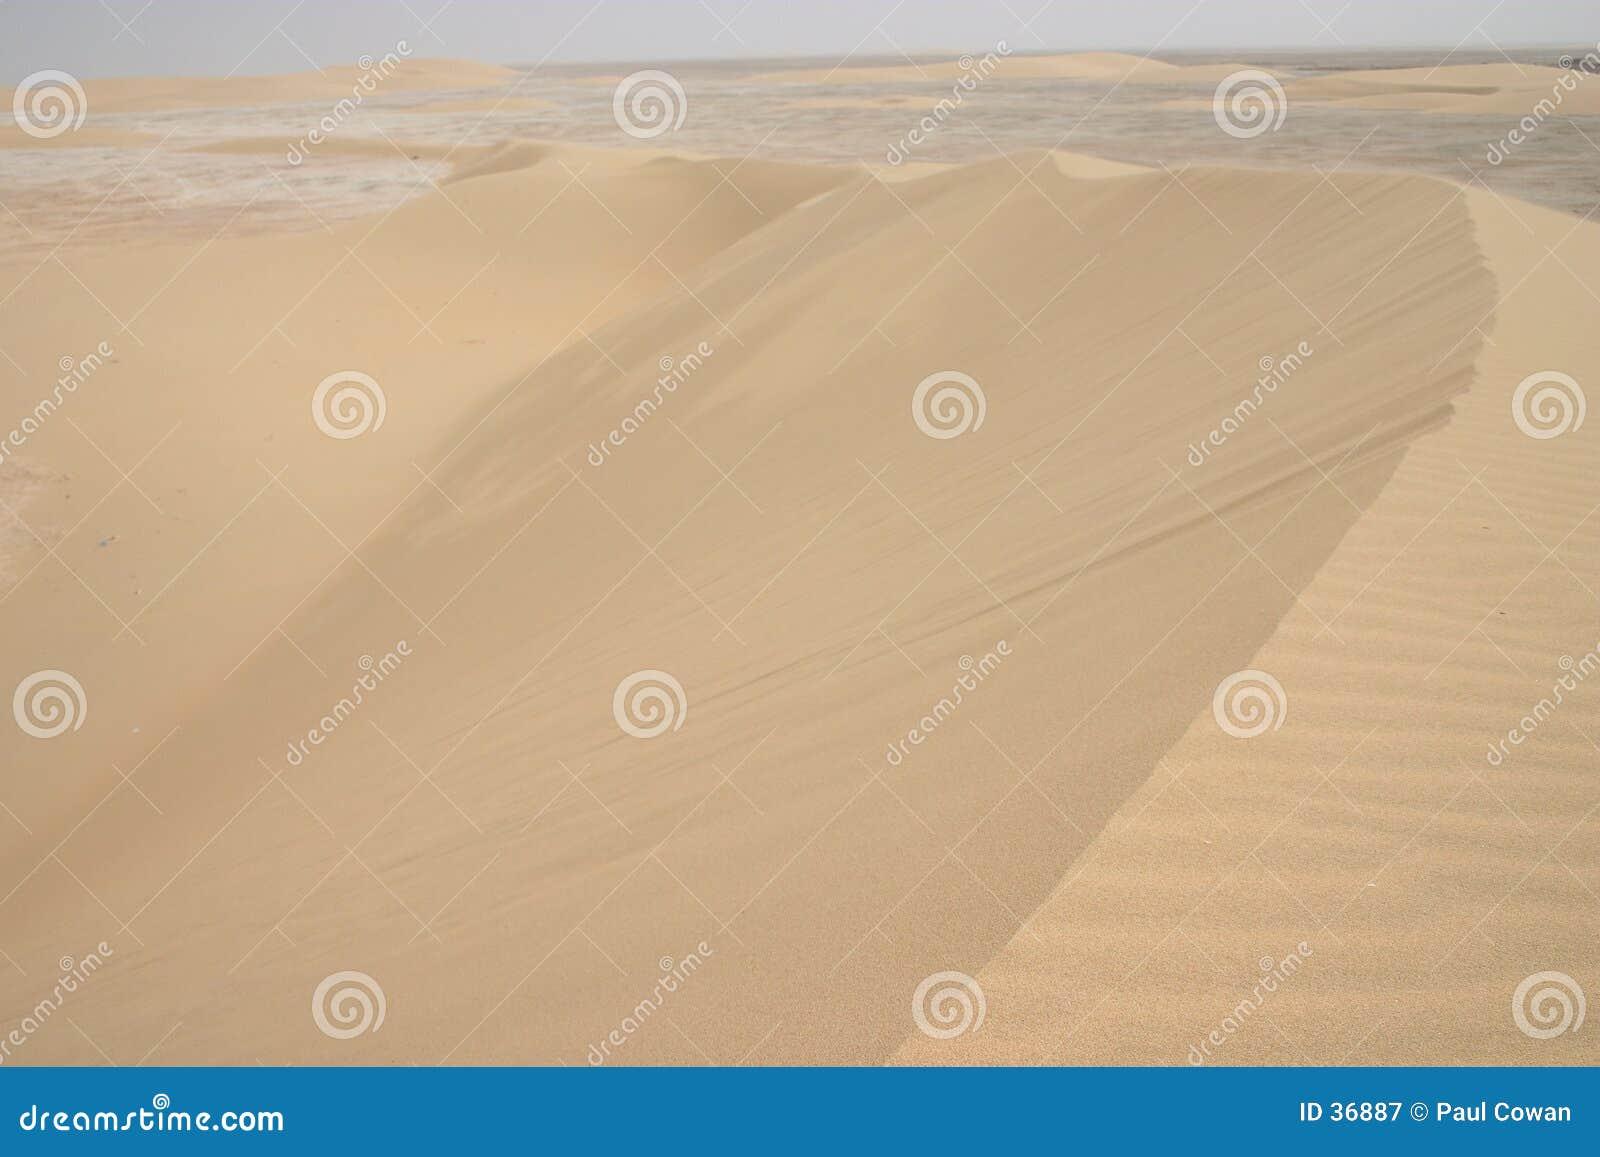 Download Tempestad de arena árabe imagen de archivo. Imagen de desierto - 36887